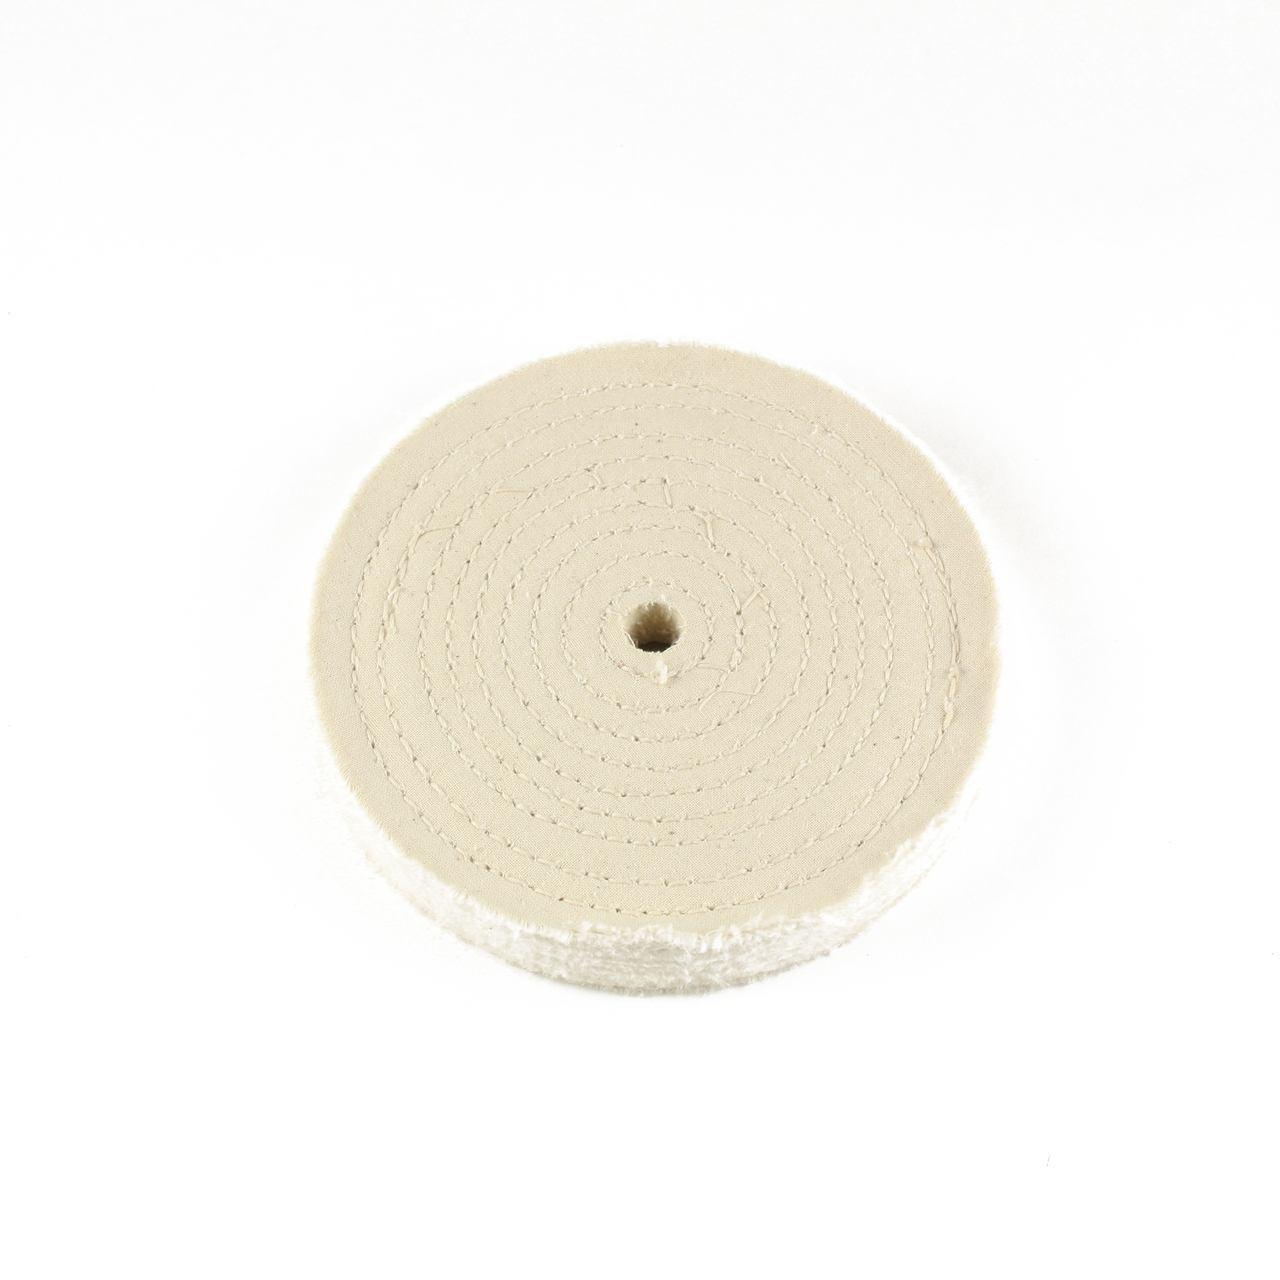 Terrific 6 X 1 2 Arbor 60 Ply Spiral Sewn Muslin Buffing Wheel Bralicious Painted Fabric Chair Ideas Braliciousco